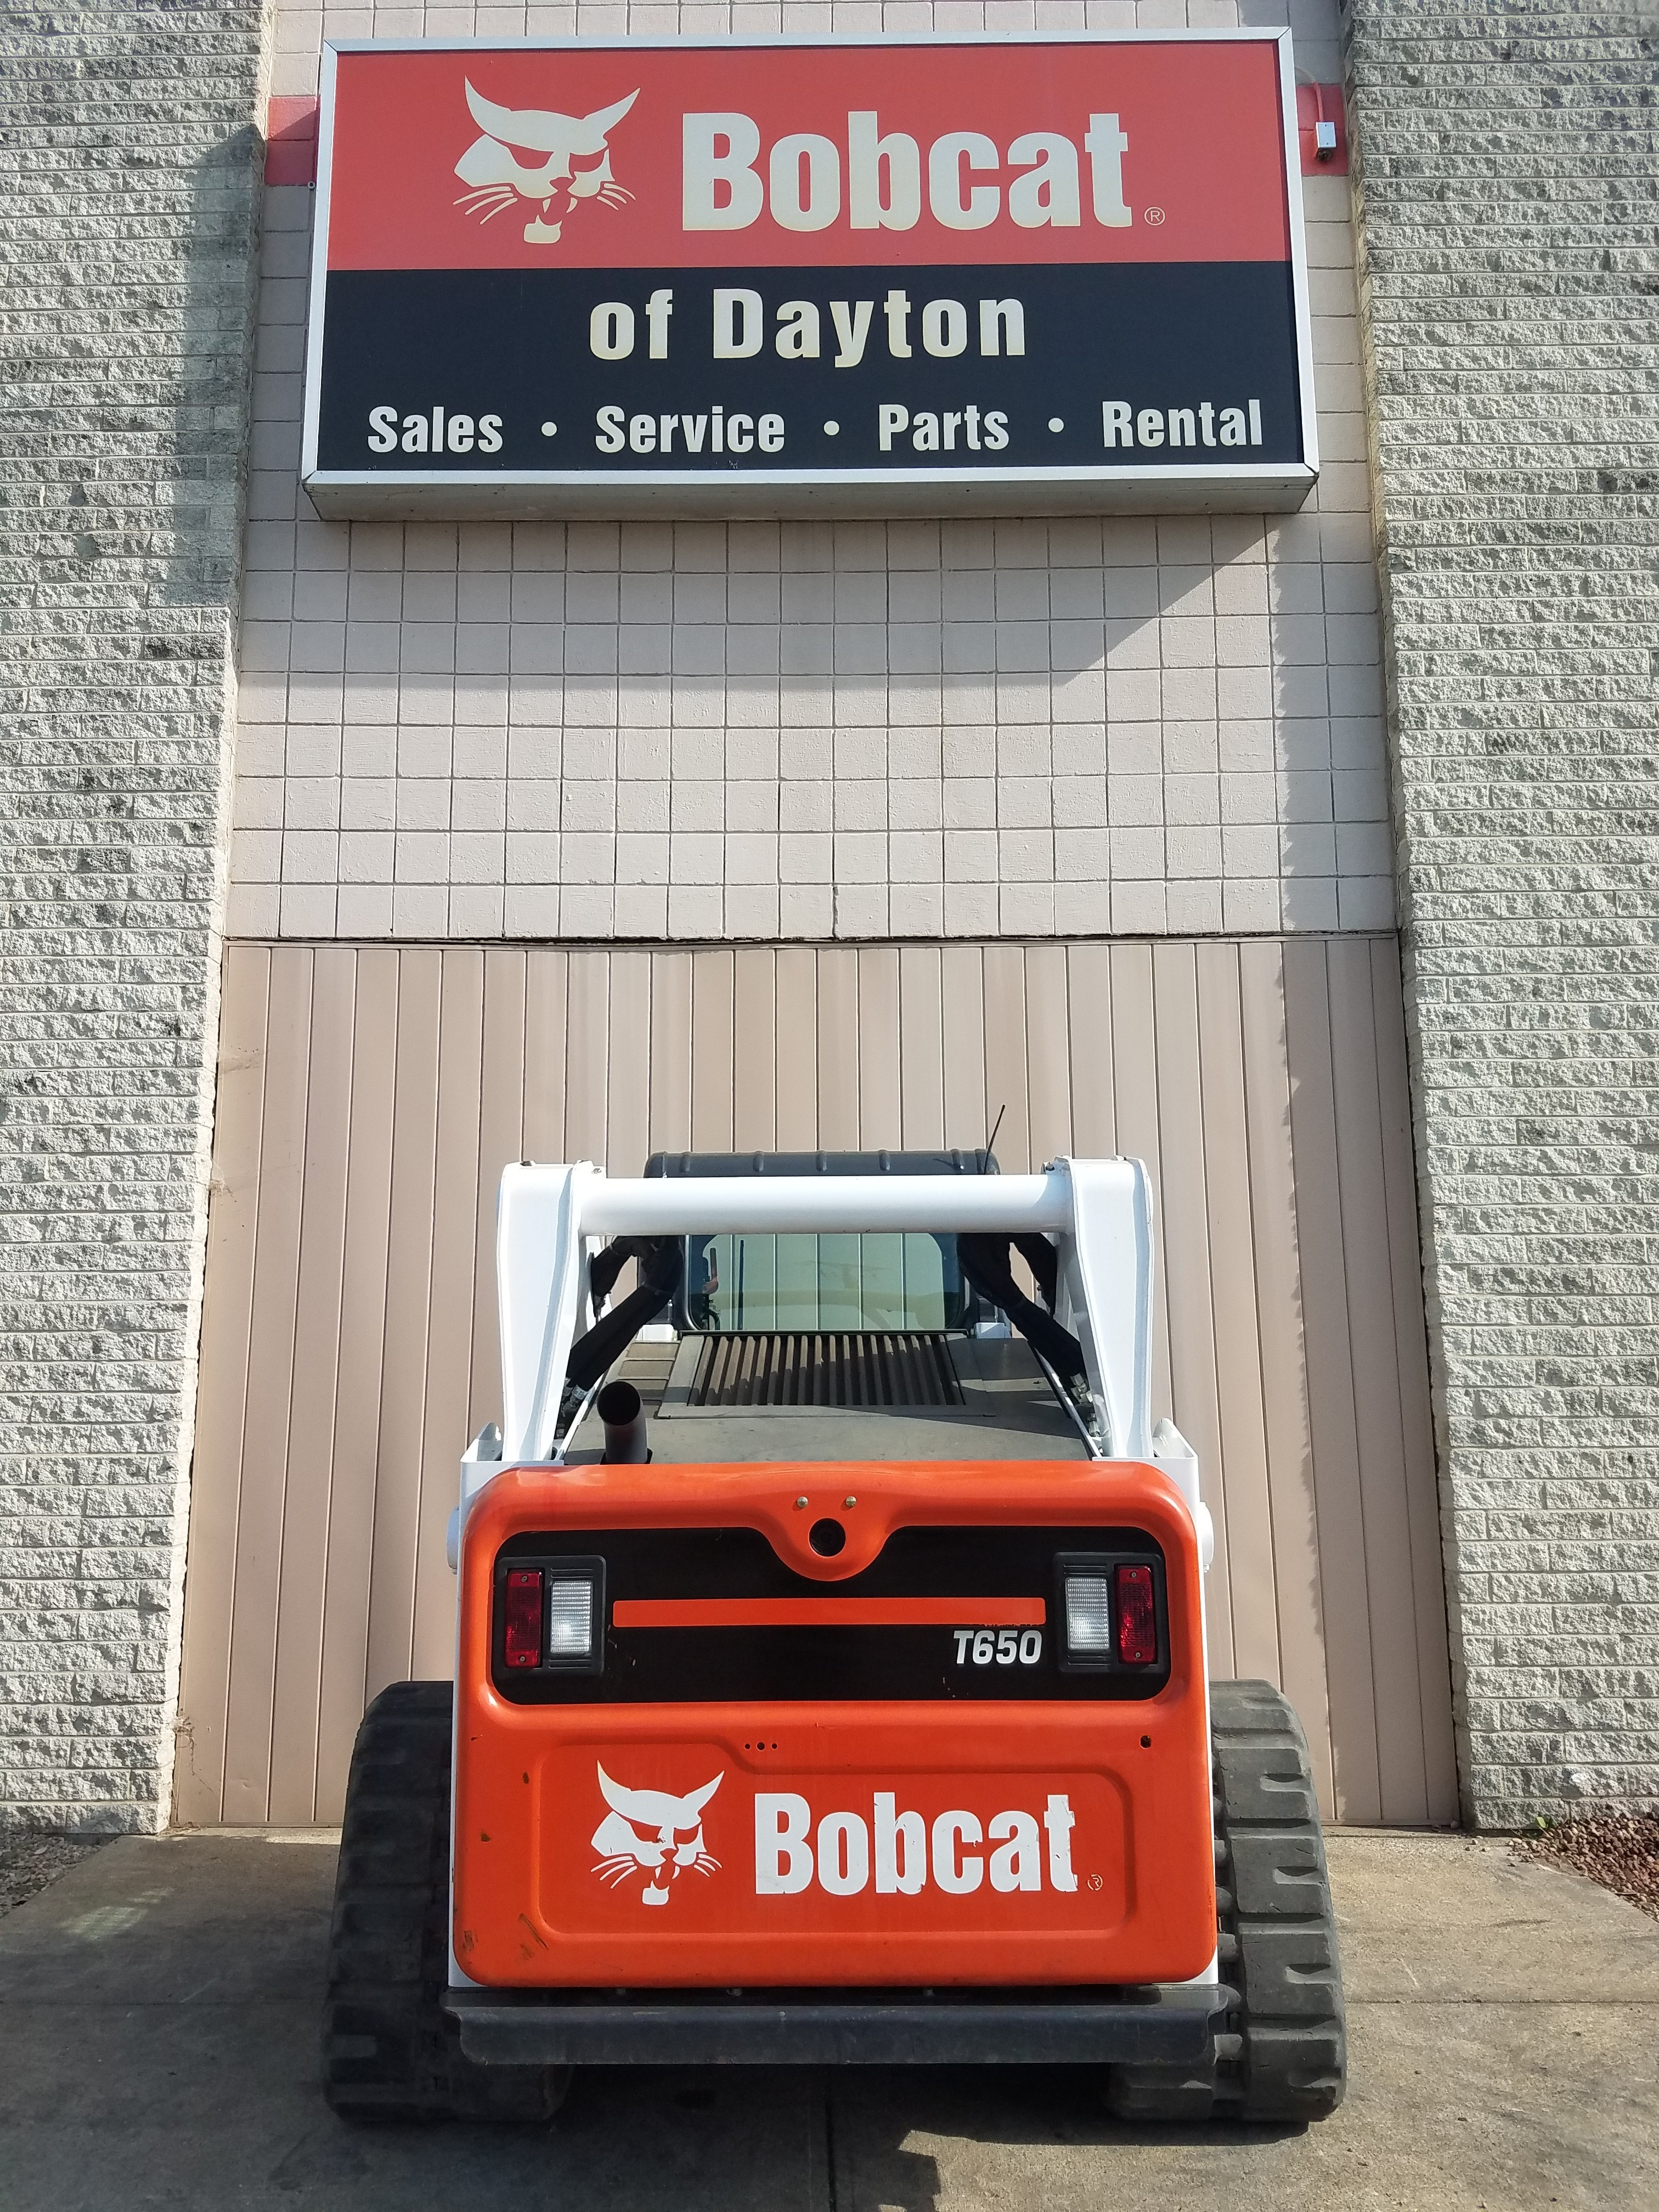 Used 2016 Bobcat T650 (Roller Suspension) in Dayton, OH